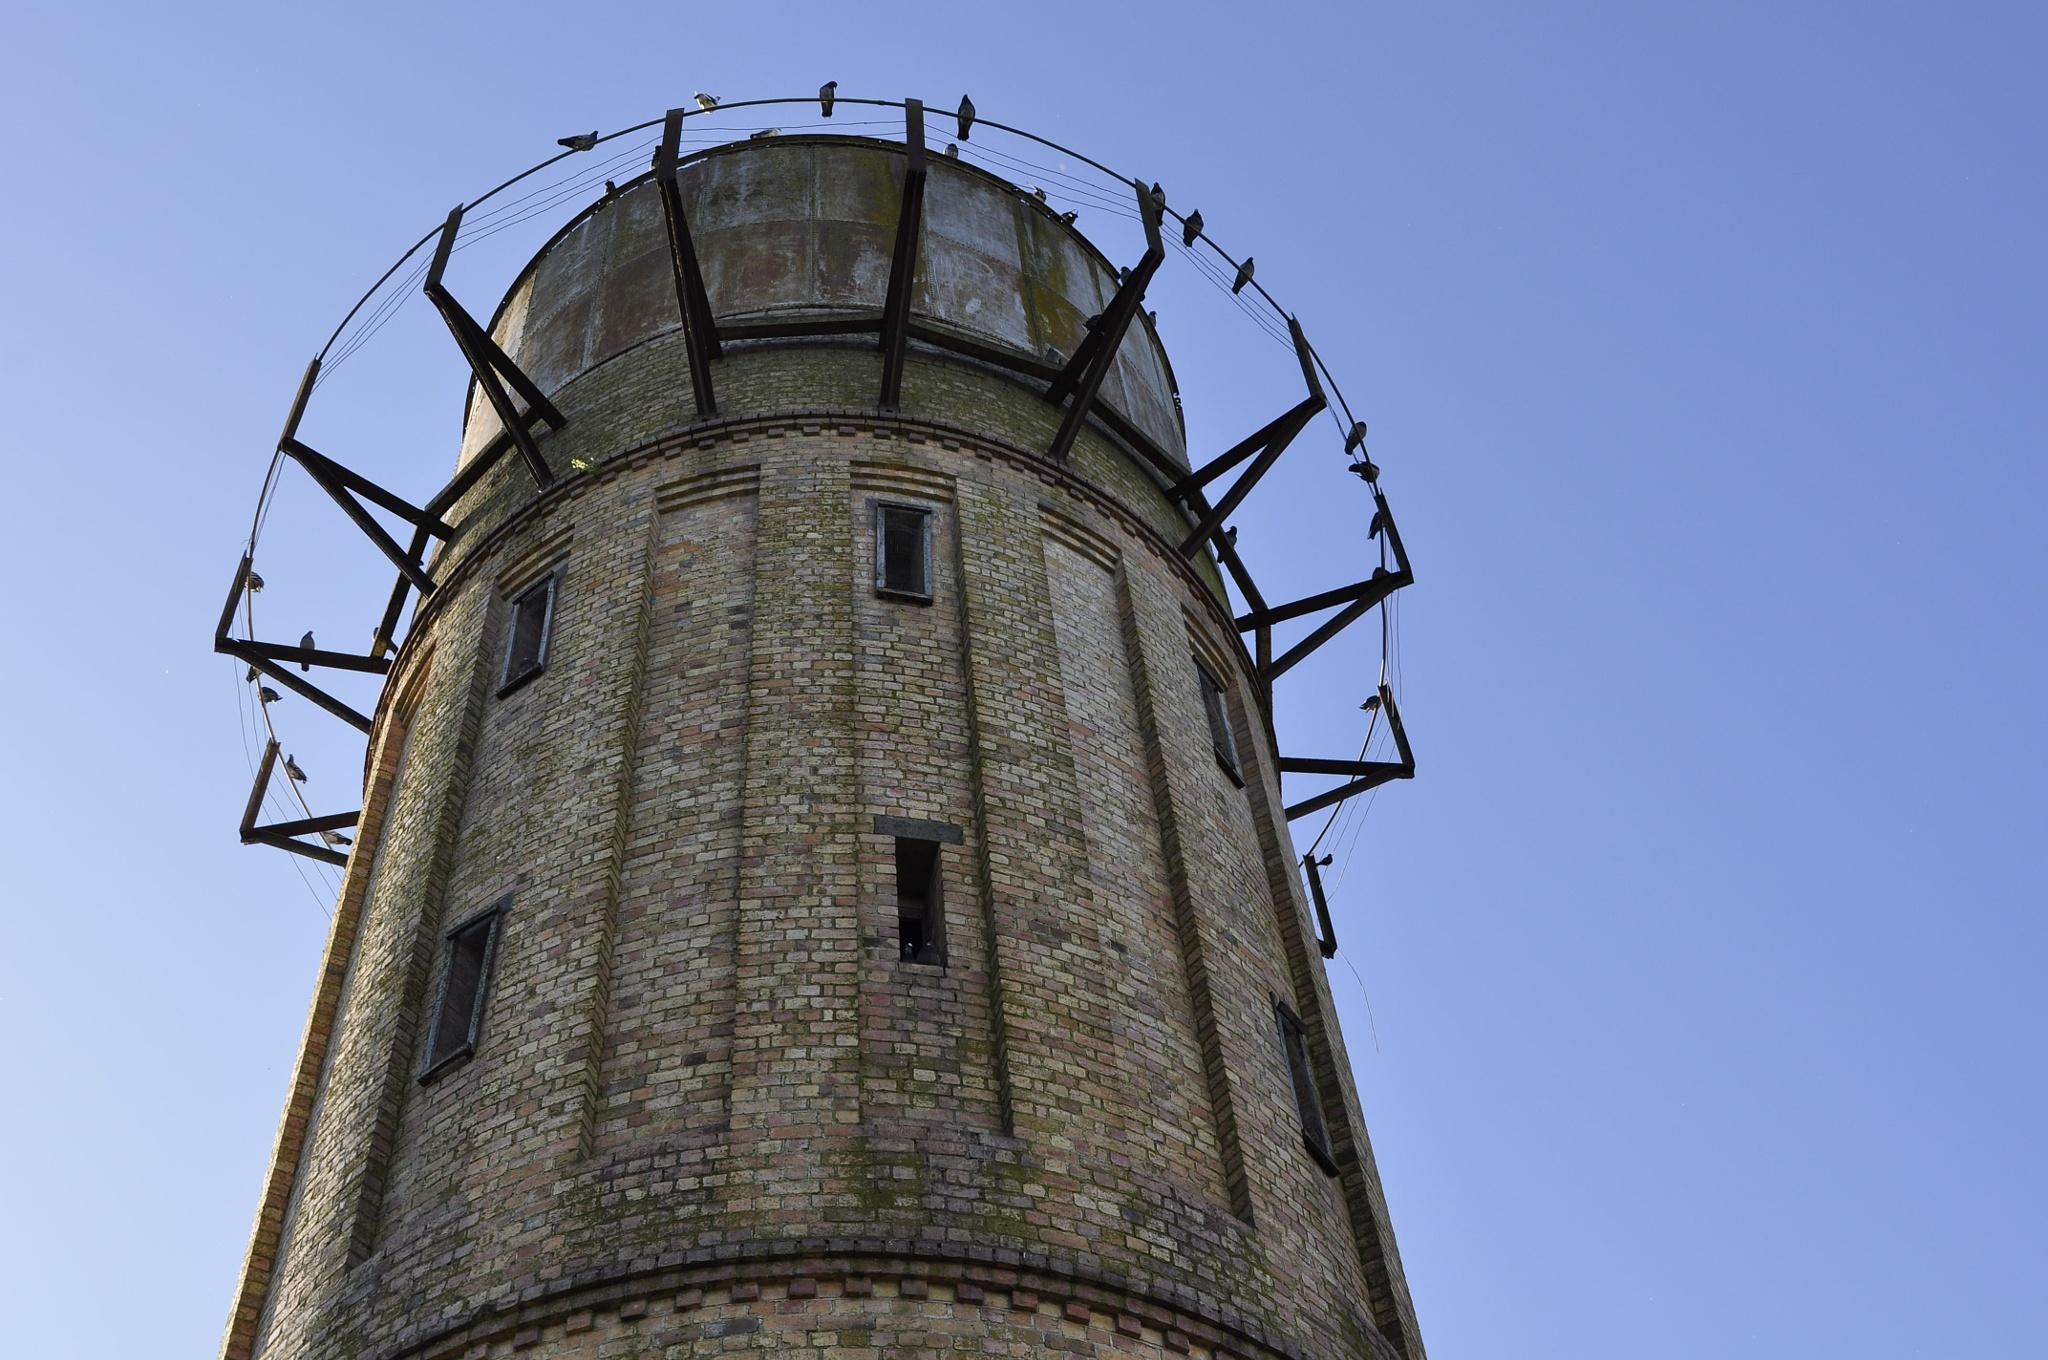 The Tower by Ellen Lauder